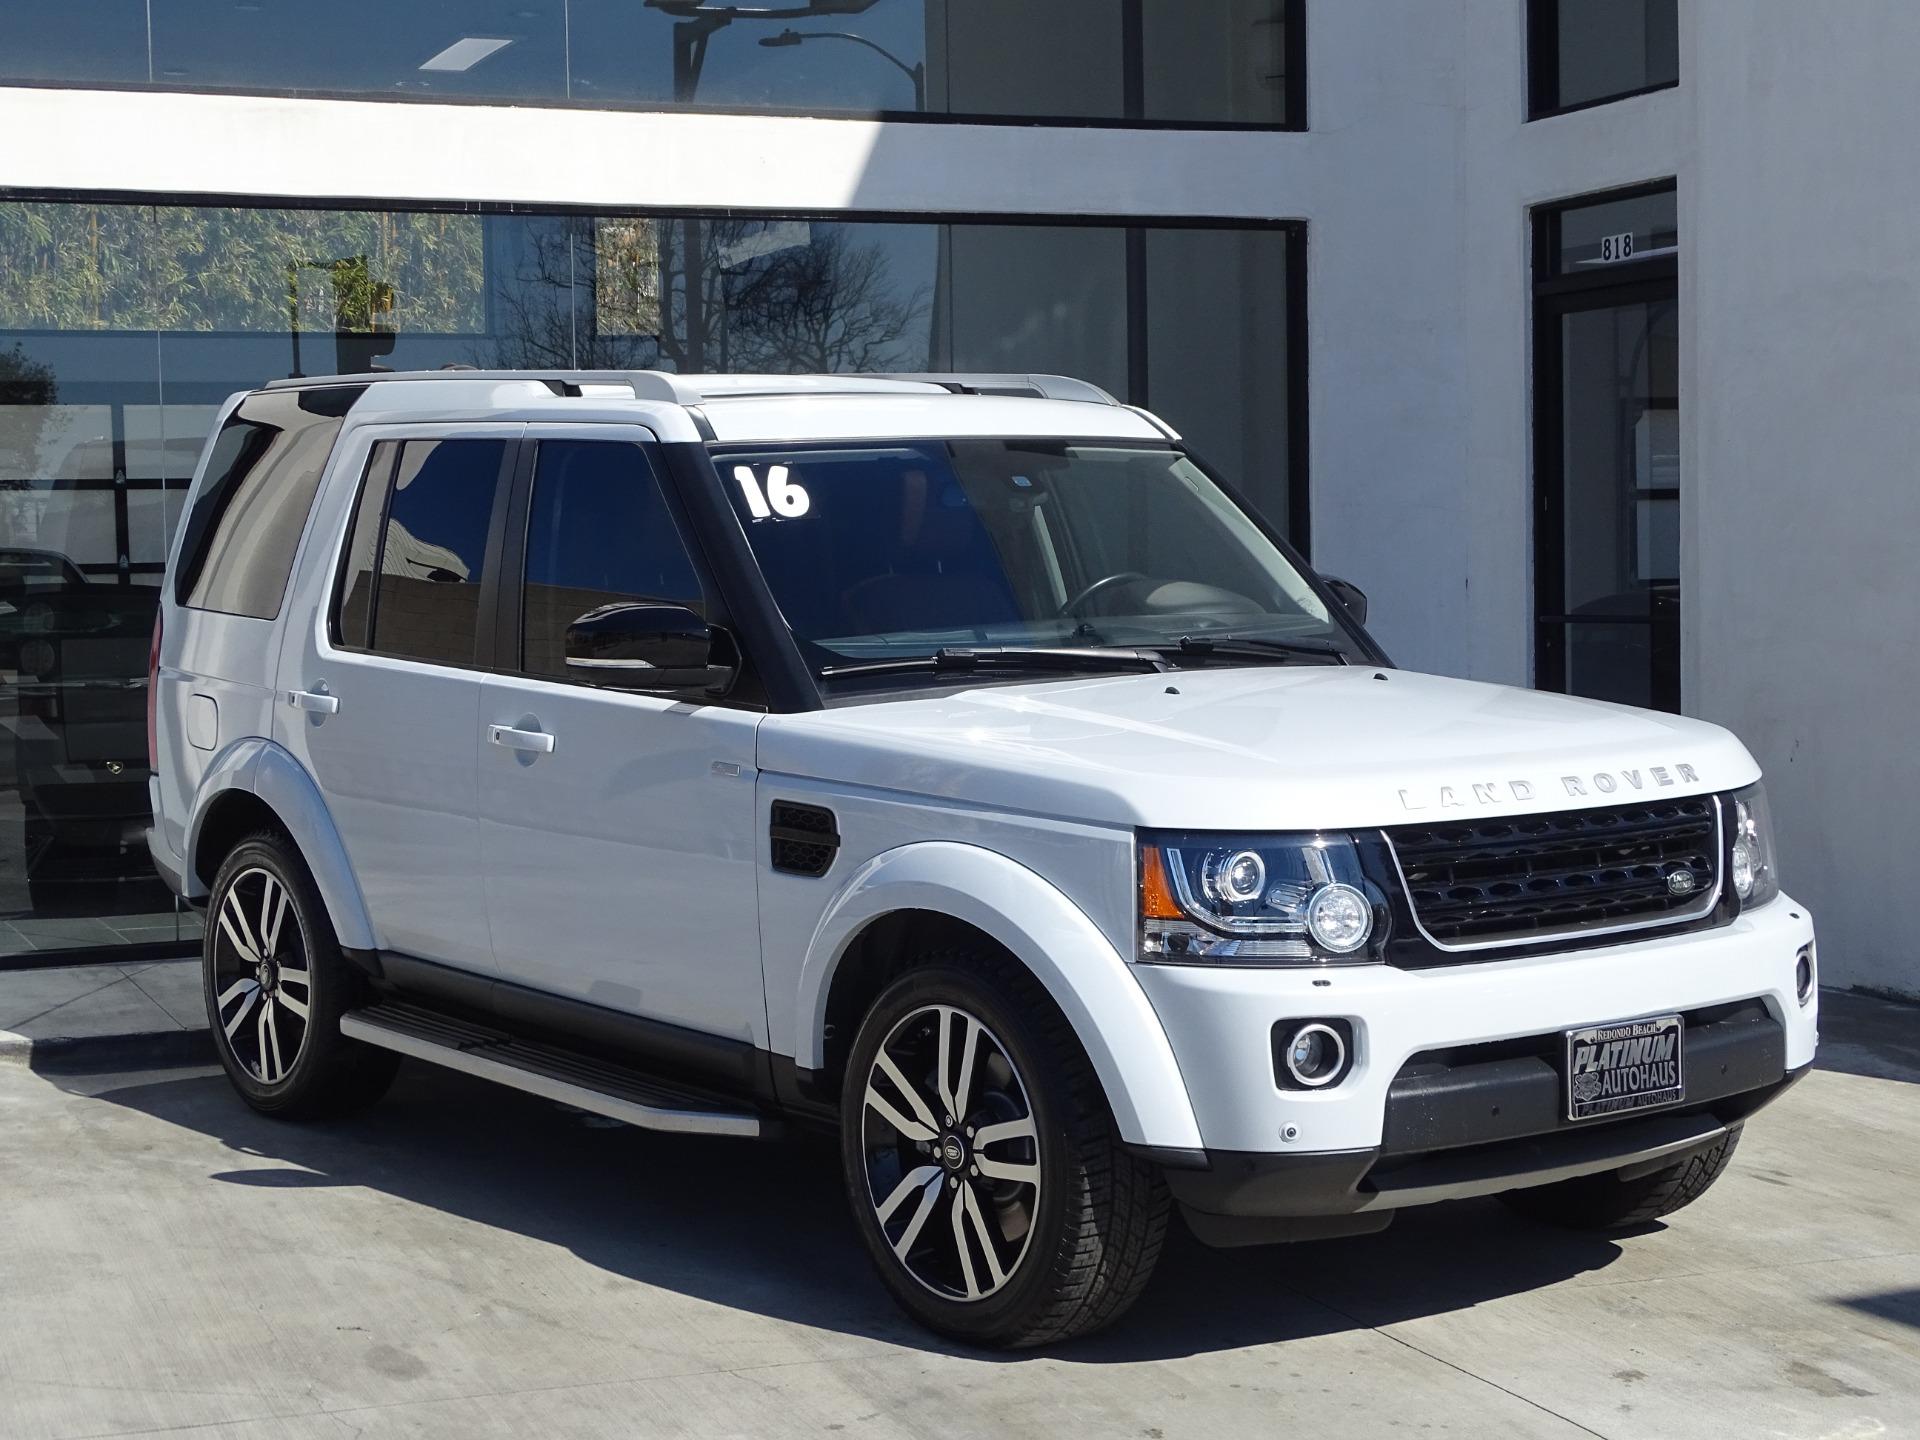 Land Rover For Sale Near Me >> 2016 Land Rover LR4 HSE LUX *** LANDMARK EDITION *** Stock # 6433 for sale near Redondo Beach ...